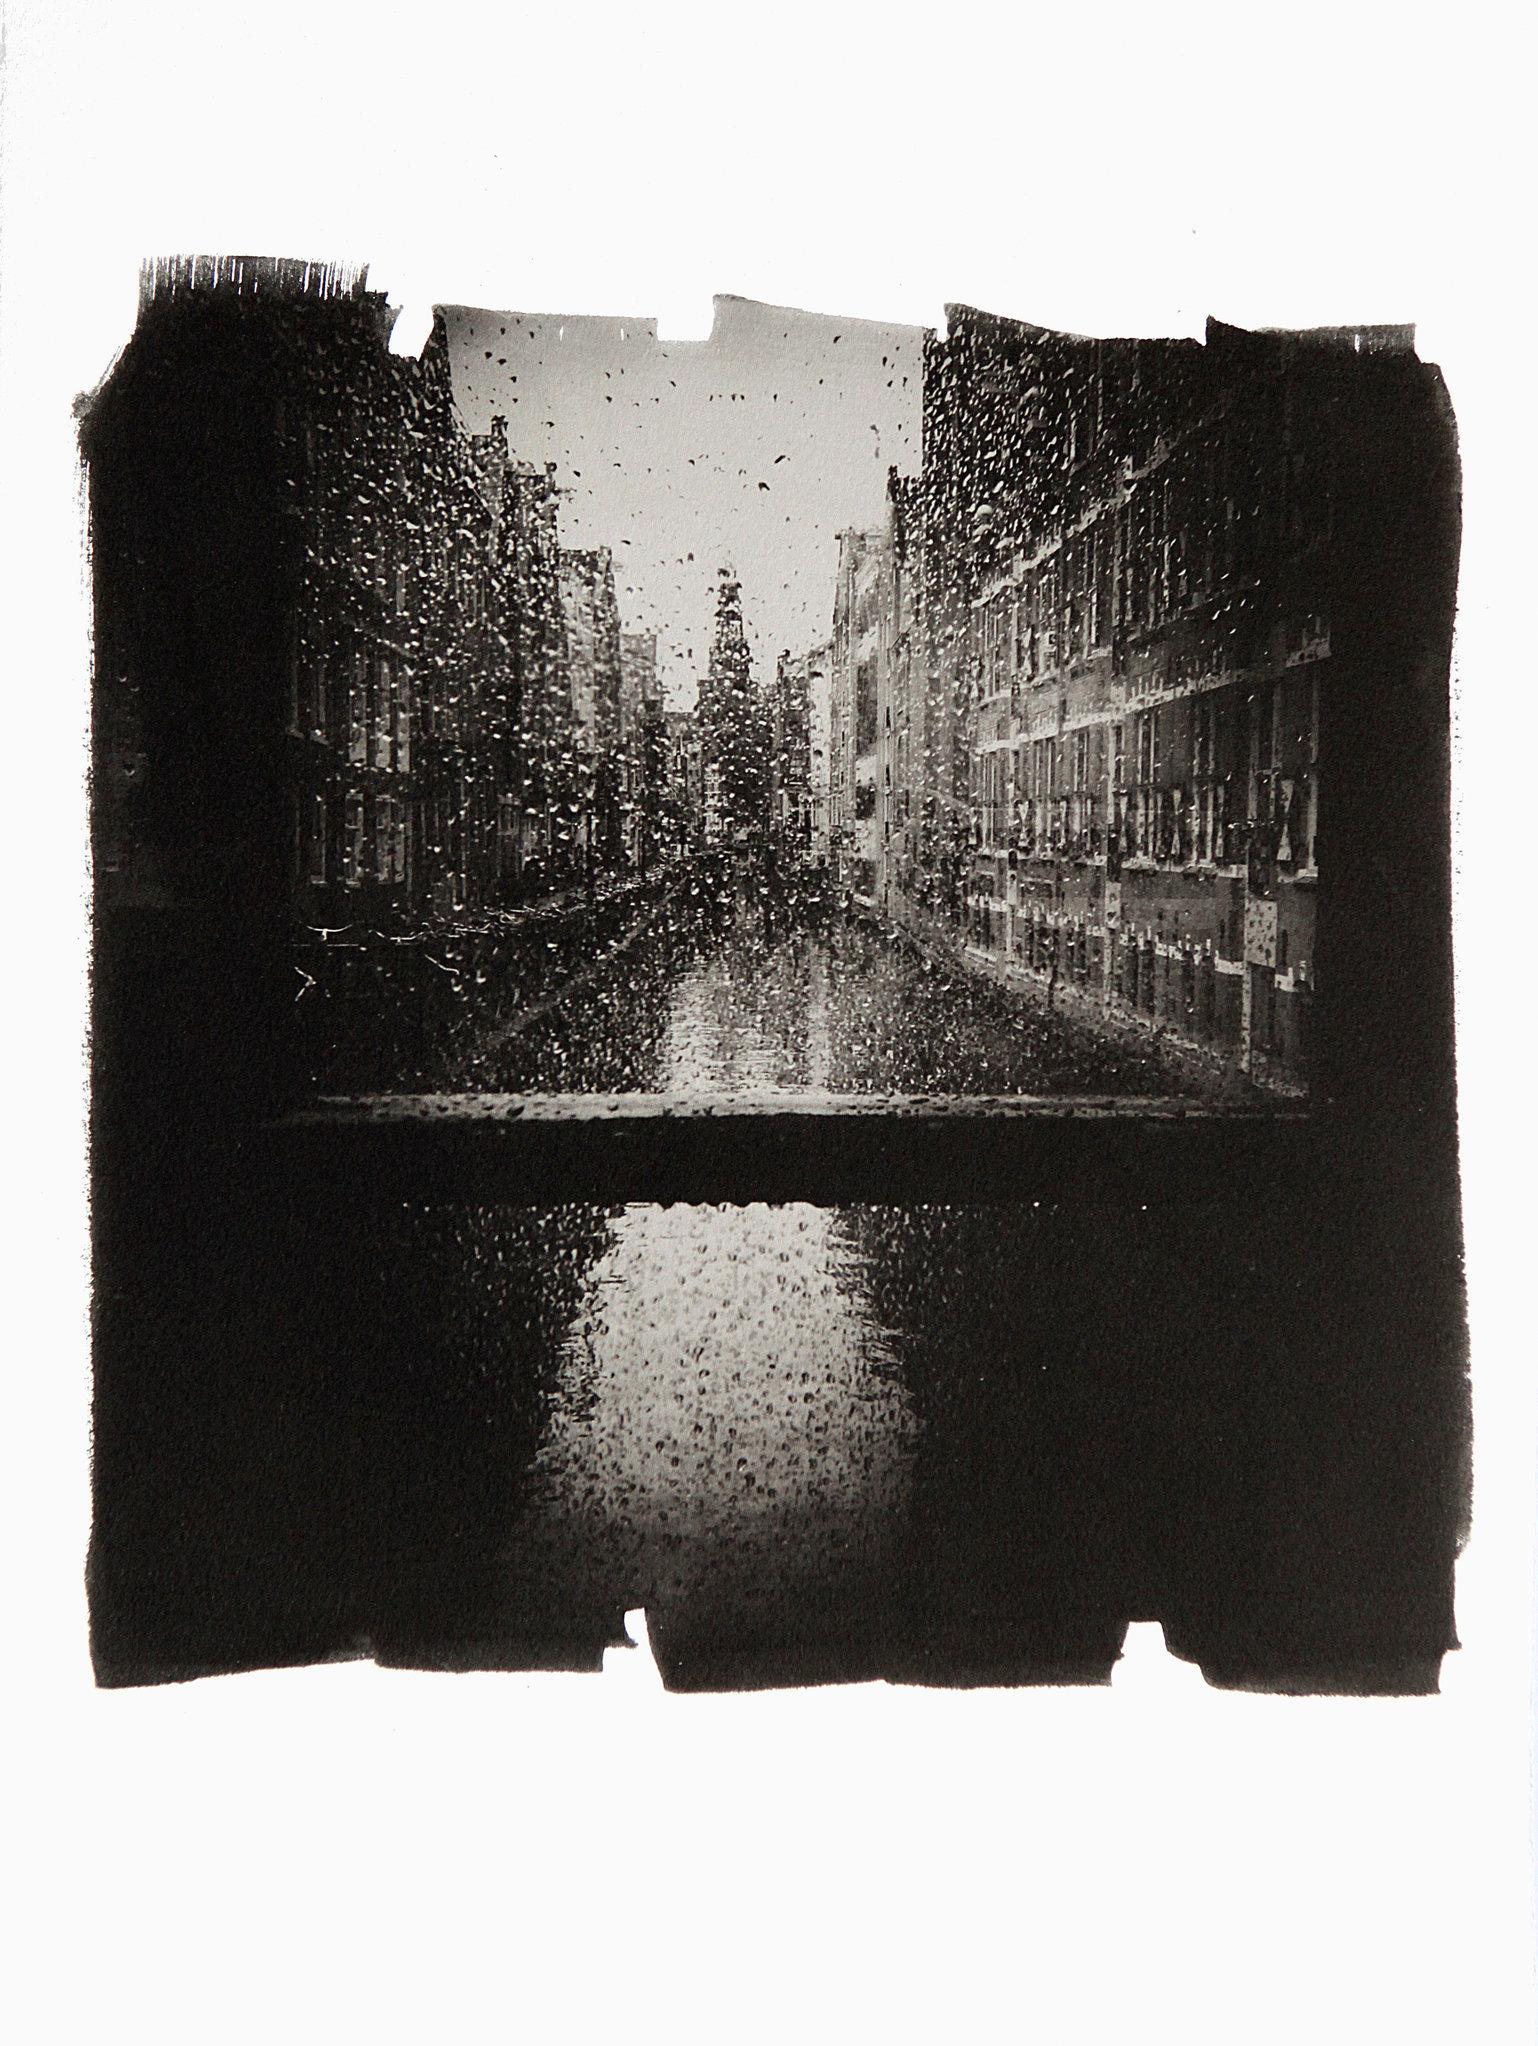 AMSTERDAM-Palladium-11.JPG